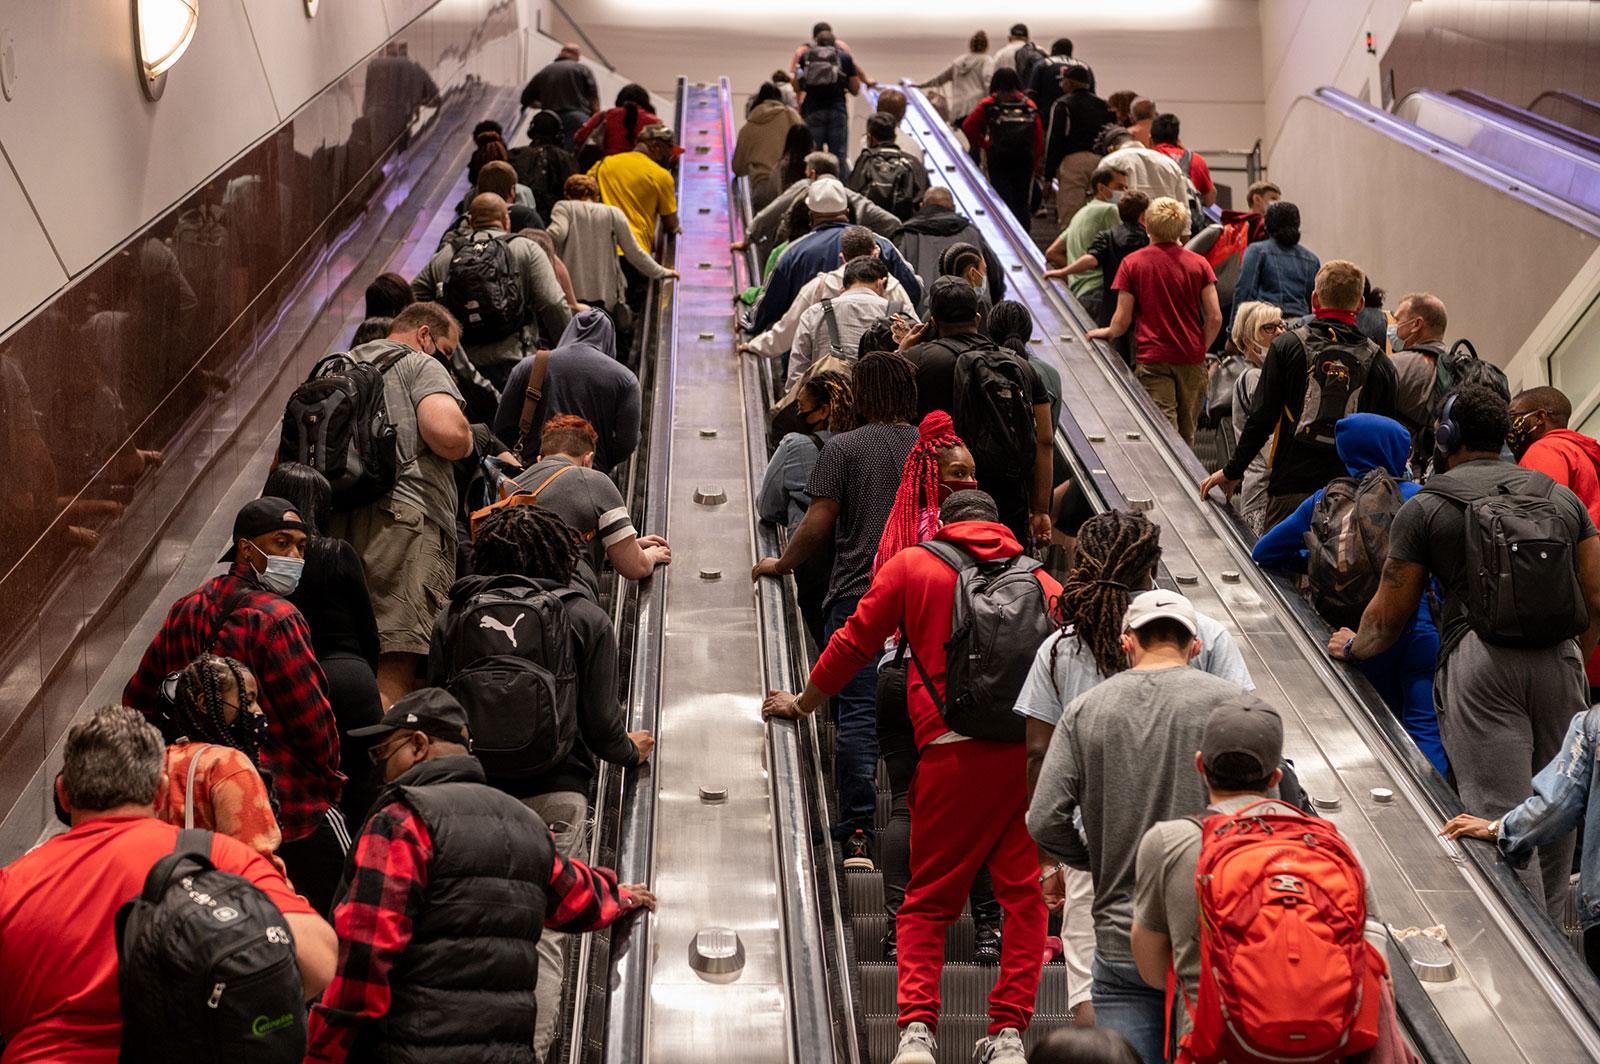 People ride escalators at Atlanta's Hartsfield-Jackson International Airport on Friday, May 28.